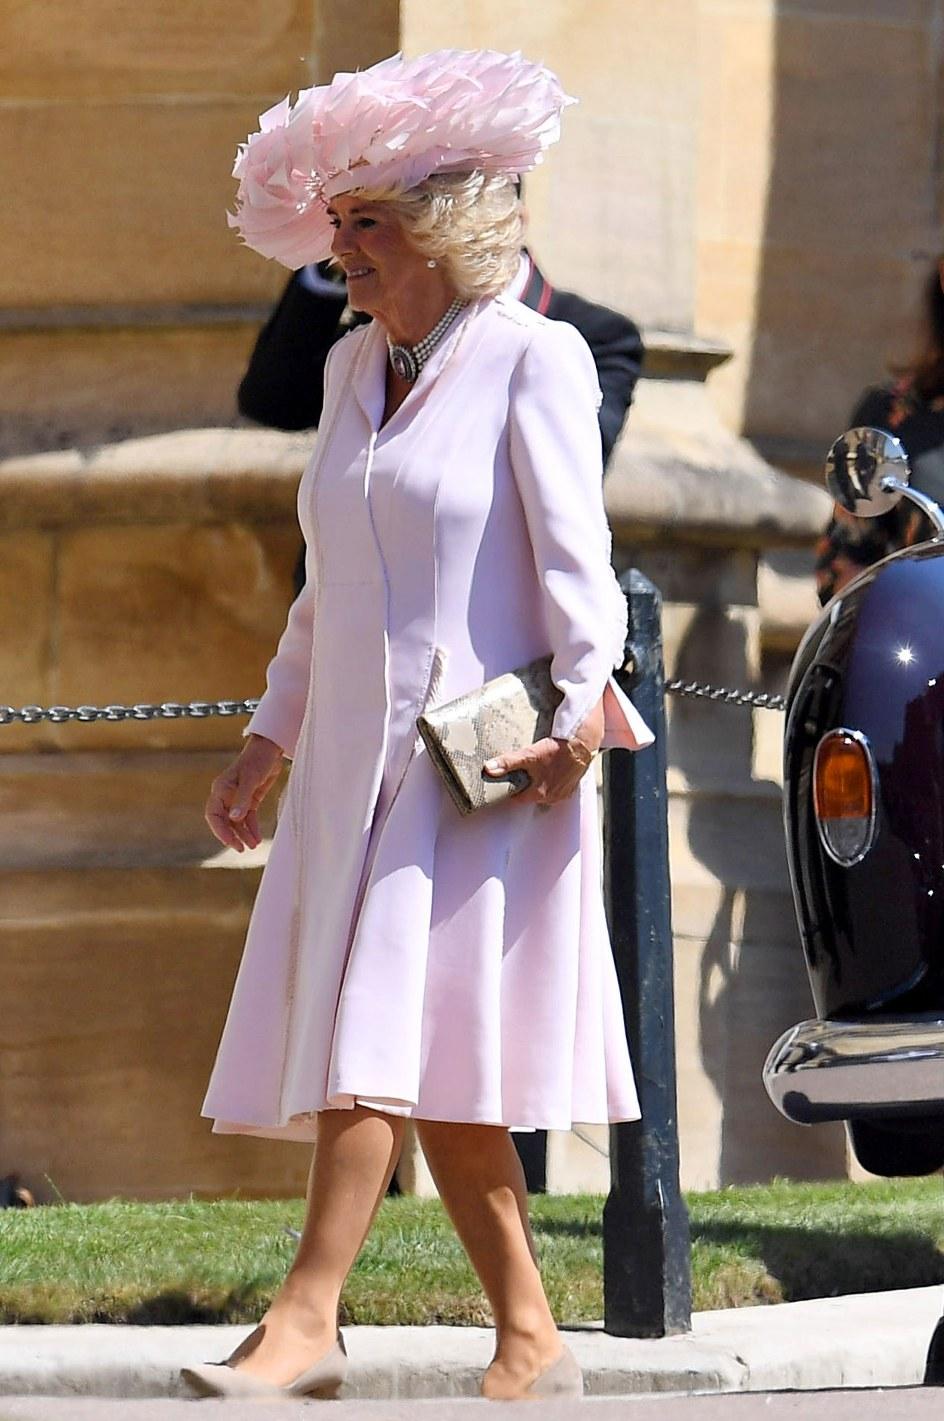 https://i1.wp.com/styleblog.ca/wp-content/uploads/2018/05/meghan-harry-royal-wedding-camilla-duchess-of-cornwall.jpg